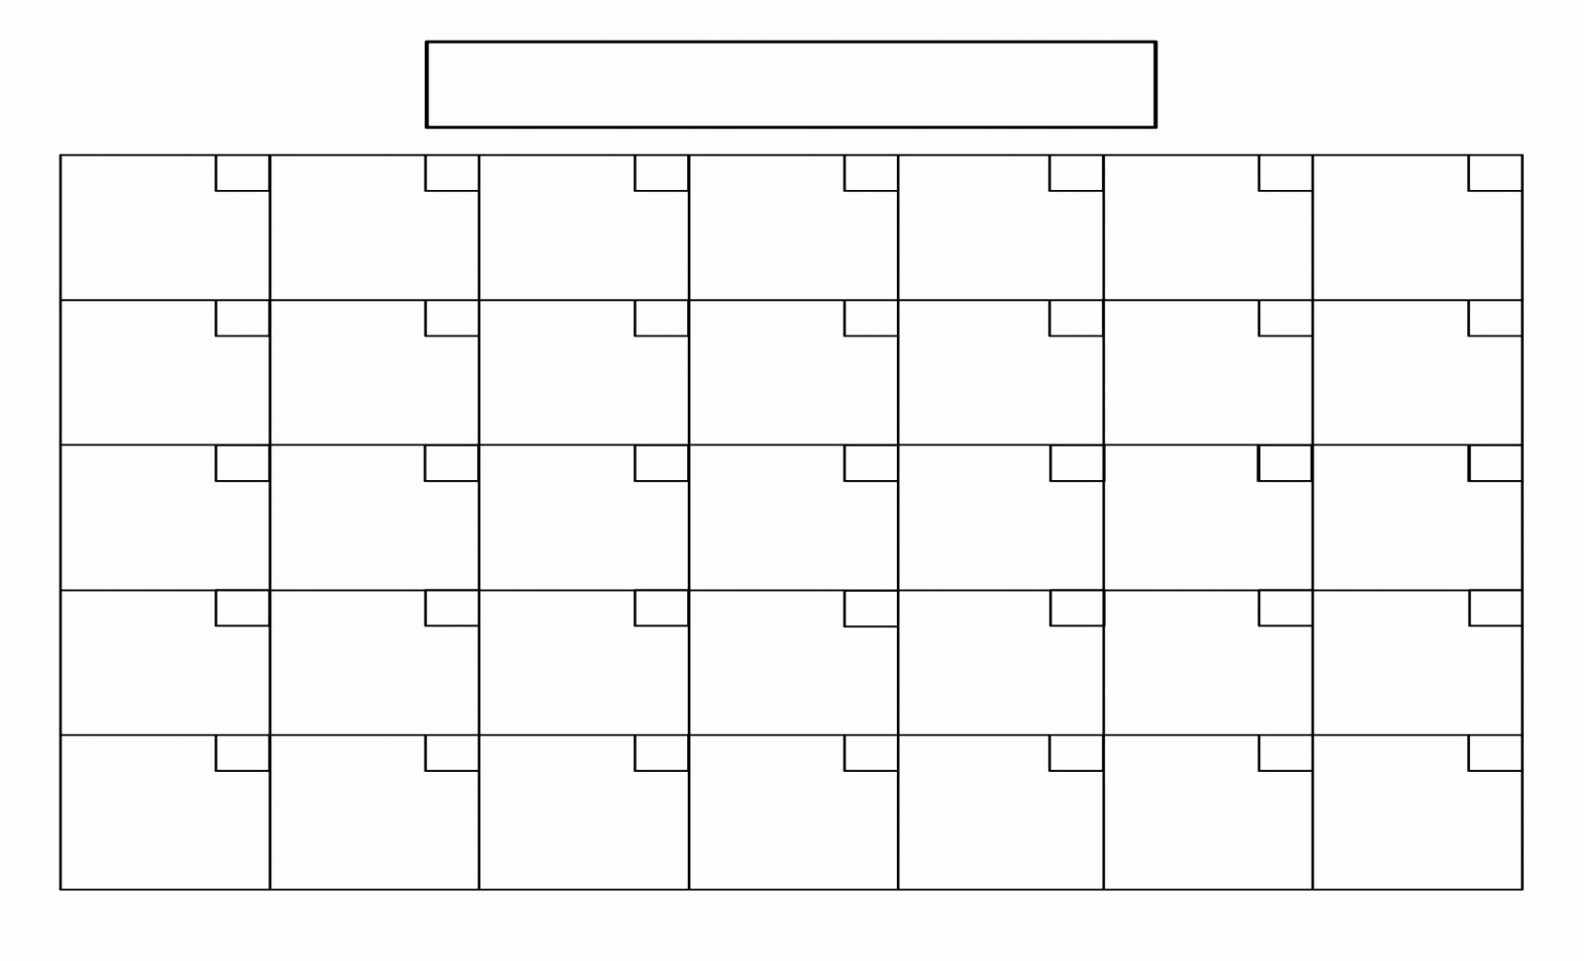 Free Printable 12 Month Calendar New Blank 12 Month Calendar Template 2017